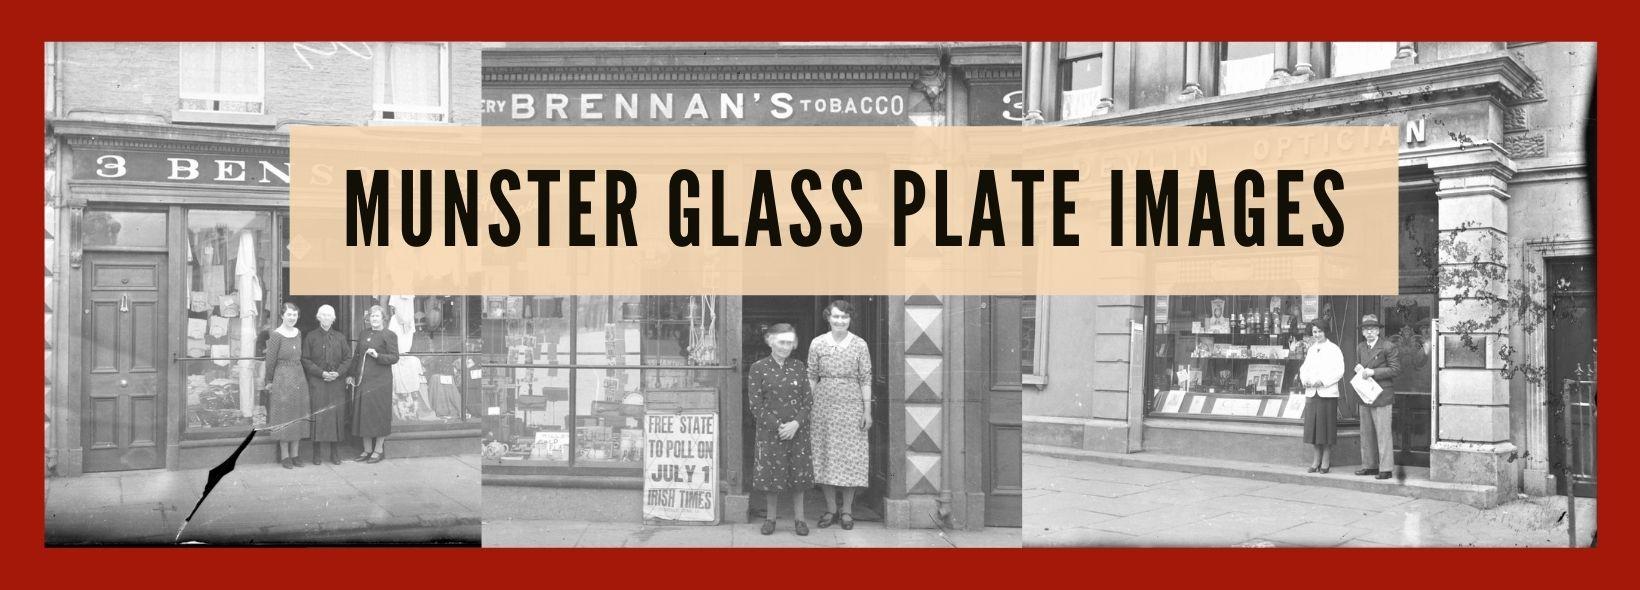 plate-glass-banner